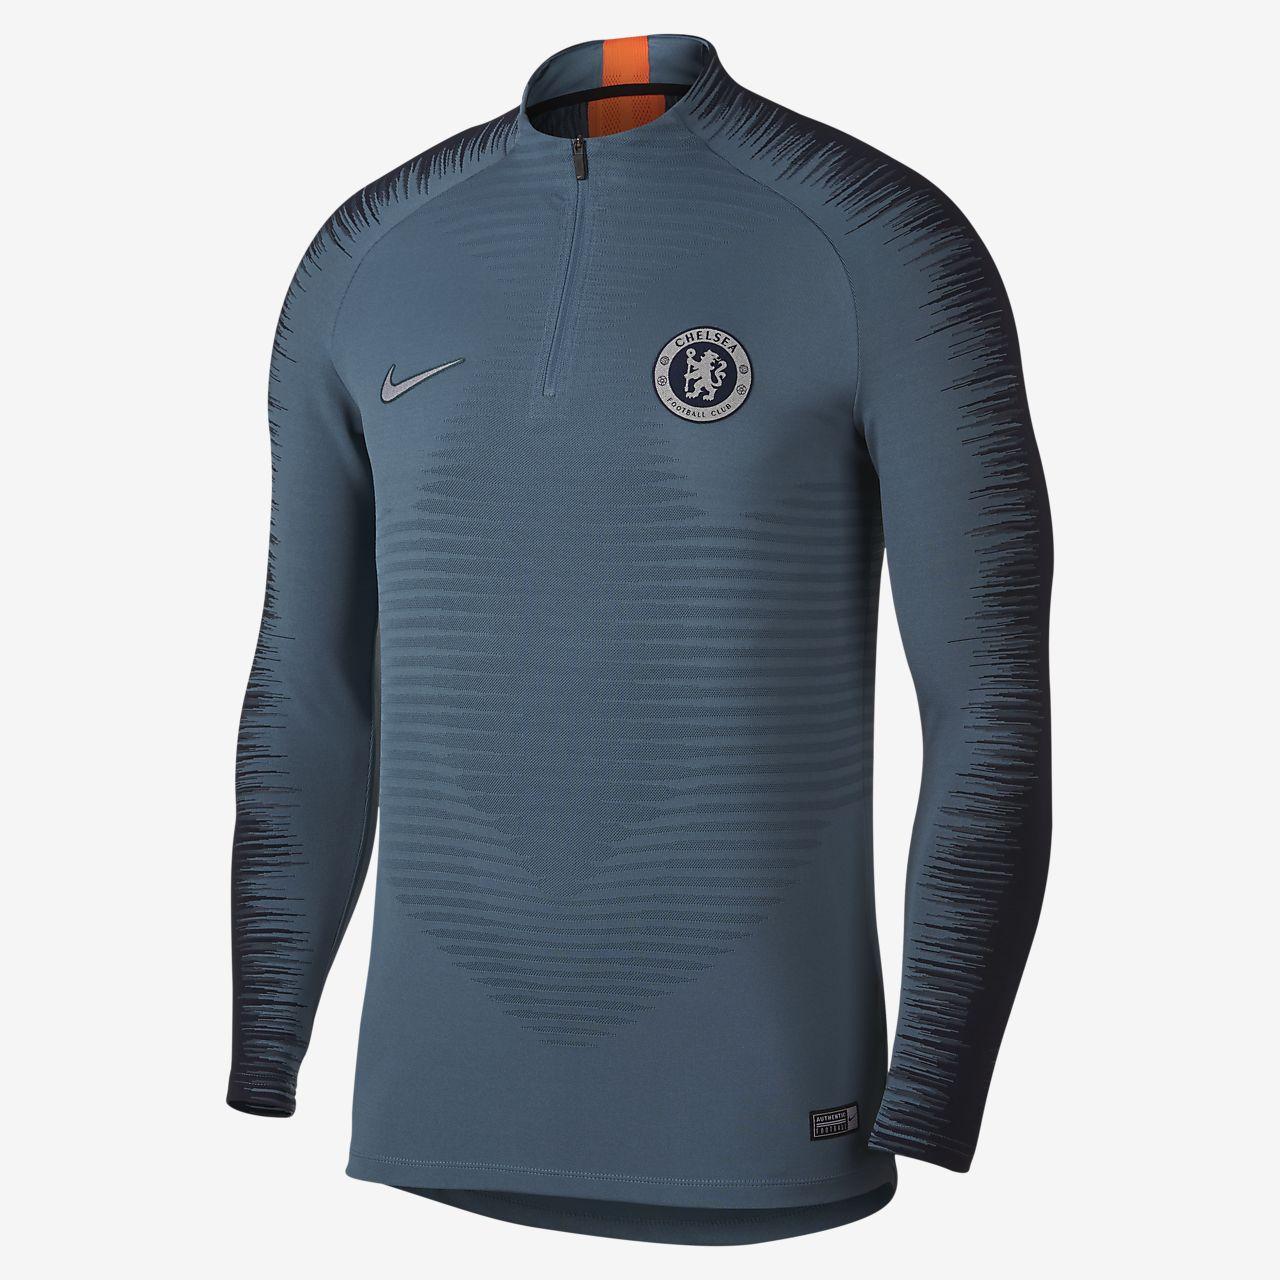 Camisola de futebol de manga comprida Chelsea FC VaporKnit Strike Drill para homem